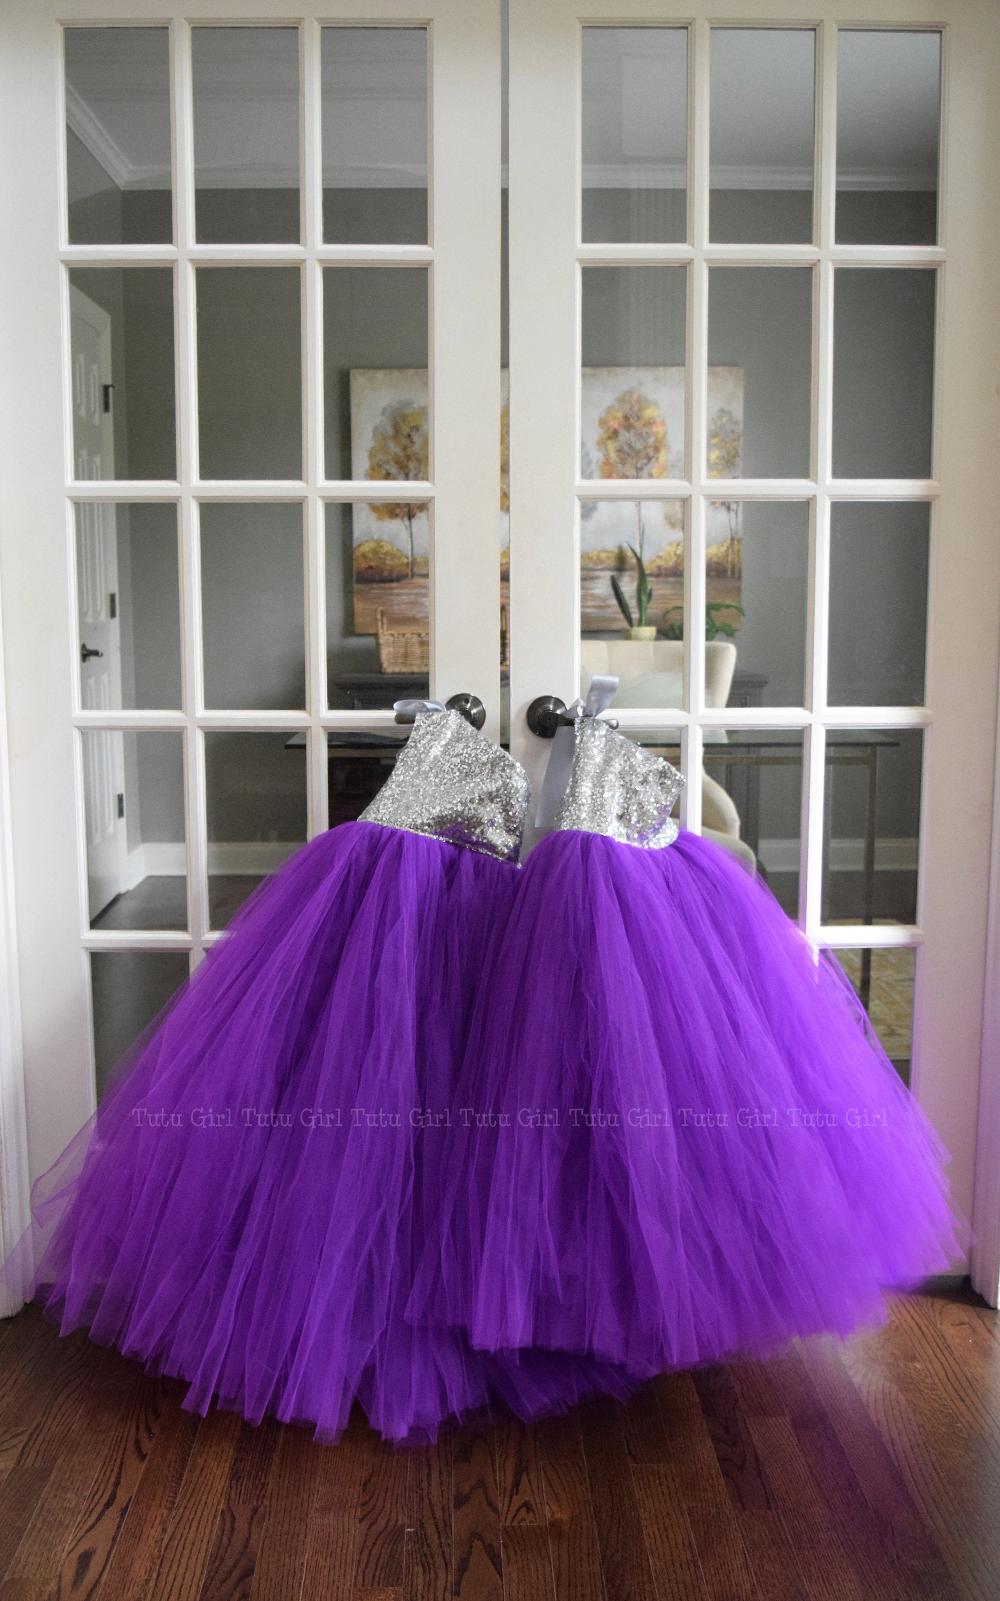 Silver And Purple Flower Girl Dress Purple Tutu Dress With Etsy Purple Flower Girl Dress Purple Flower Girls Purple Flowers [ 1601 x 1000 Pixel ]